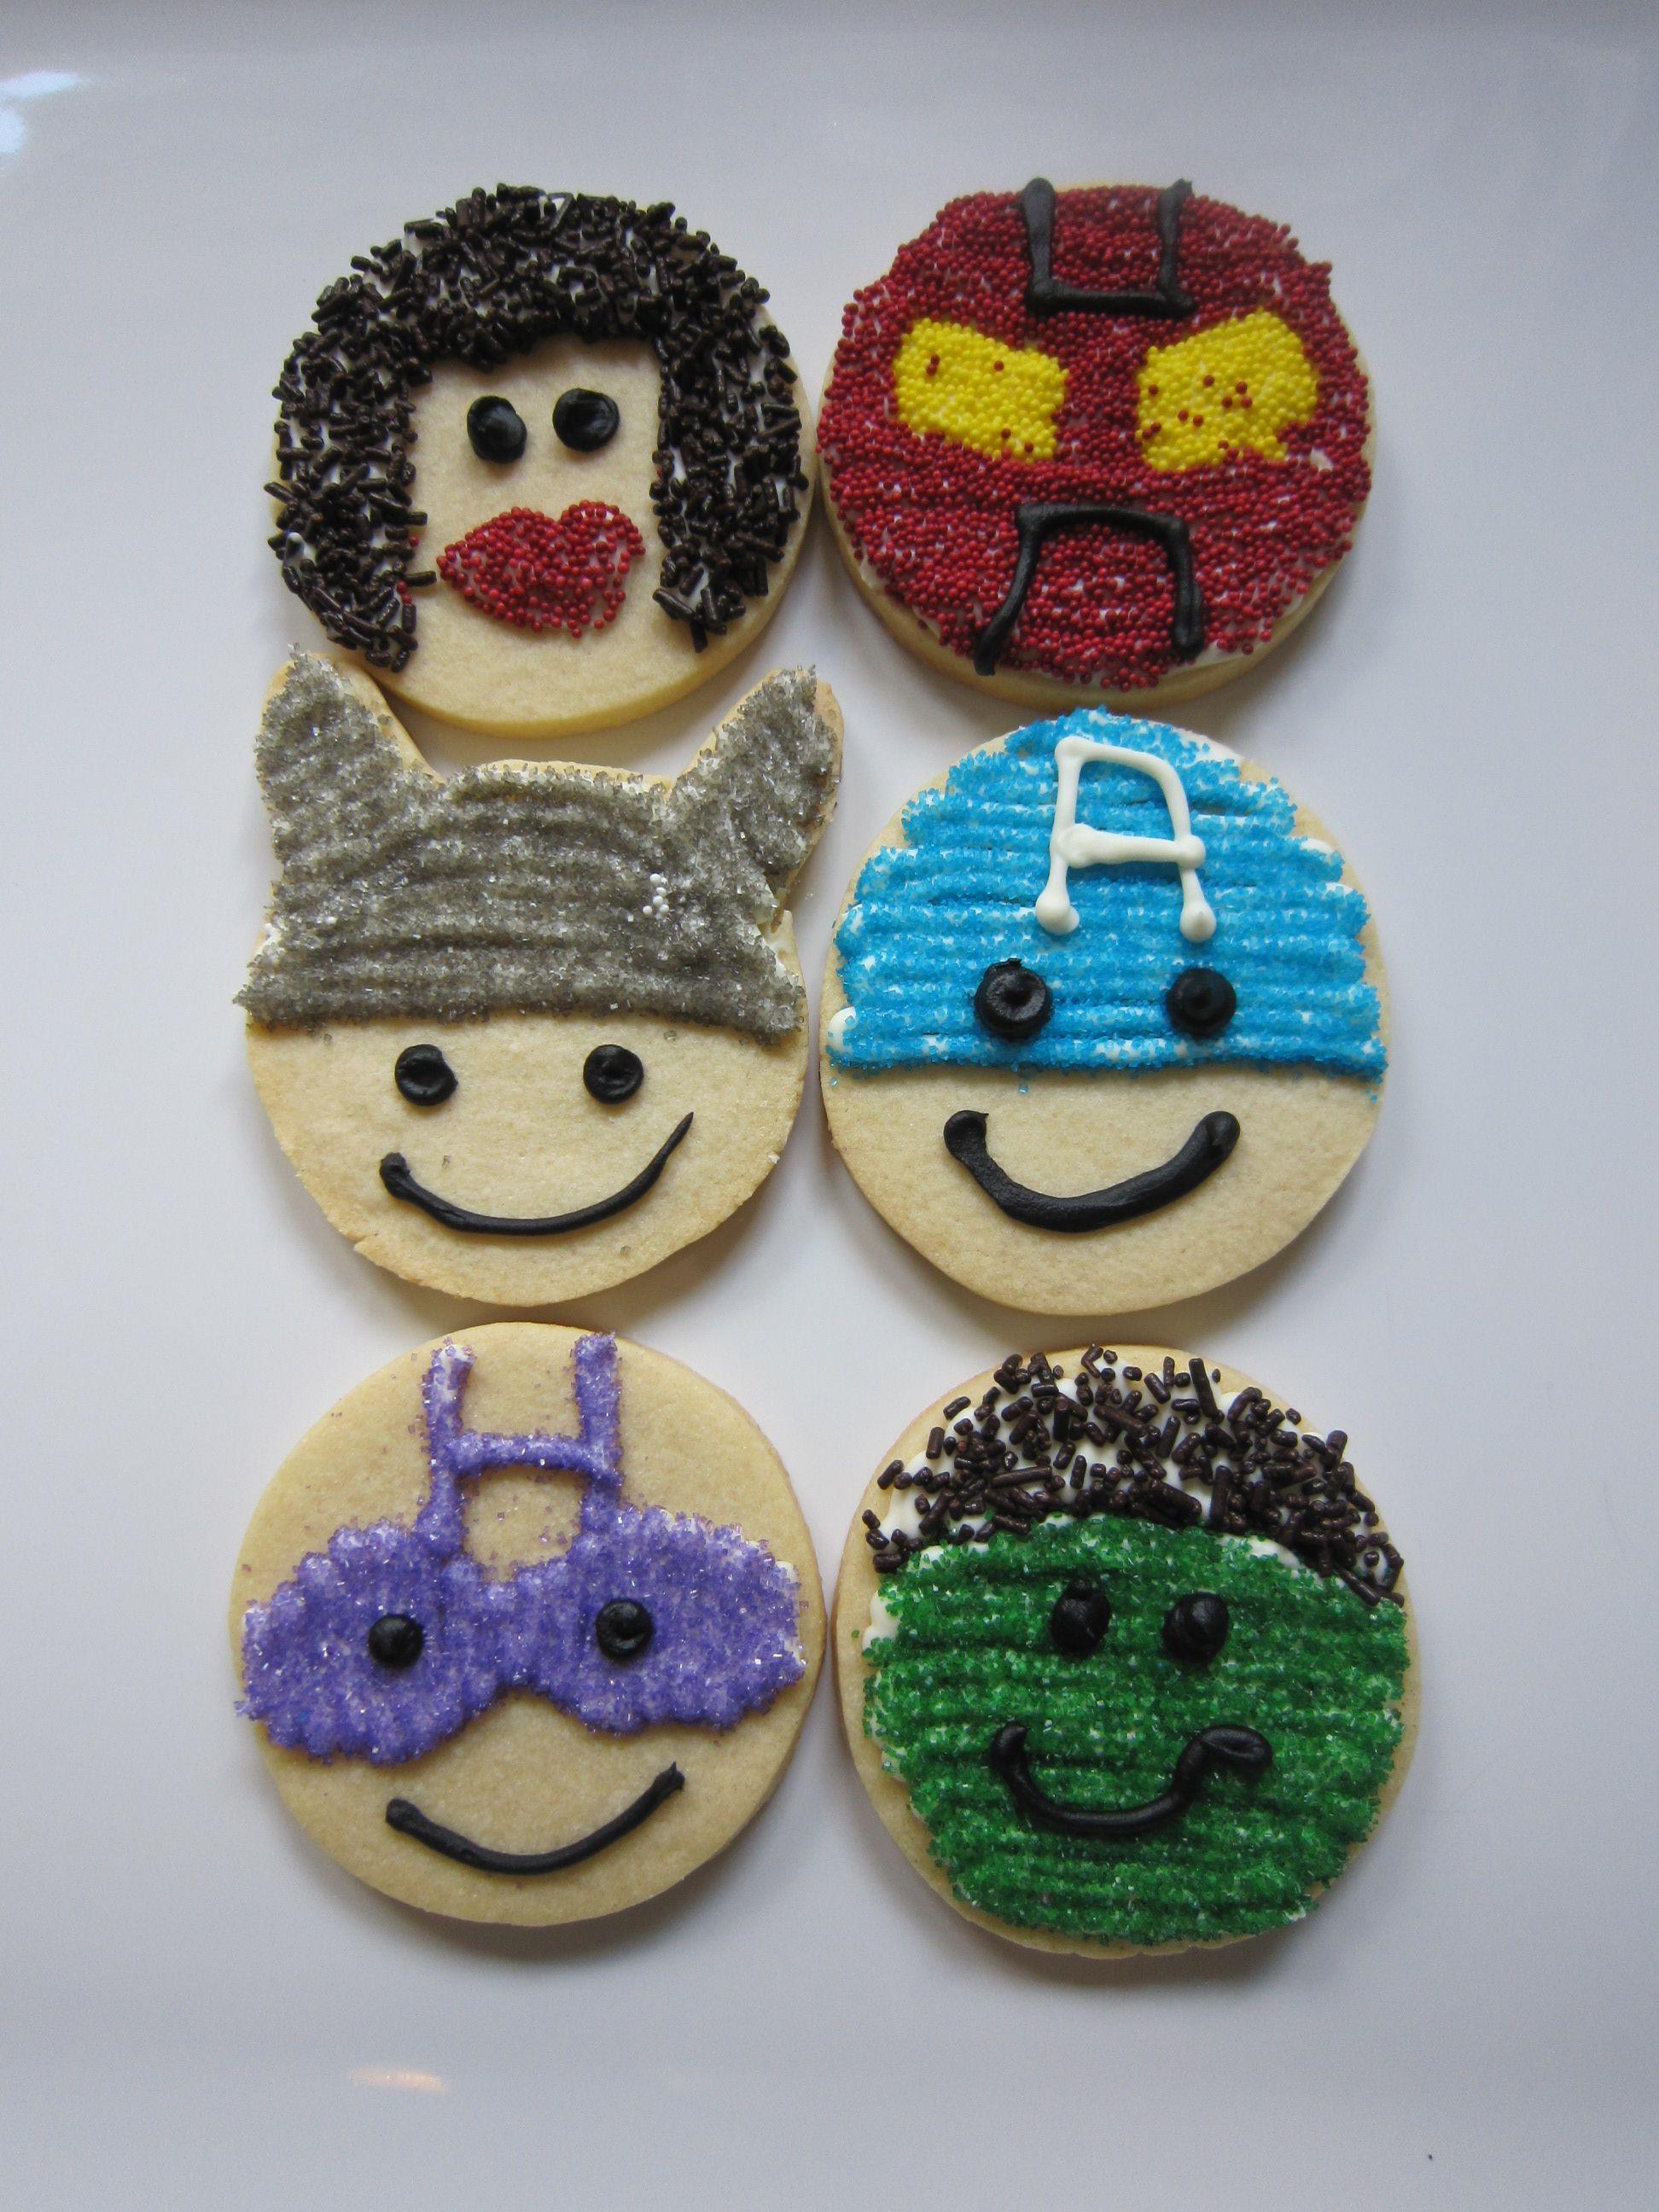 Avengers cut out cookies, Black Widow, Iron Man, Thor, Captain America, Hawkeye and Hulk